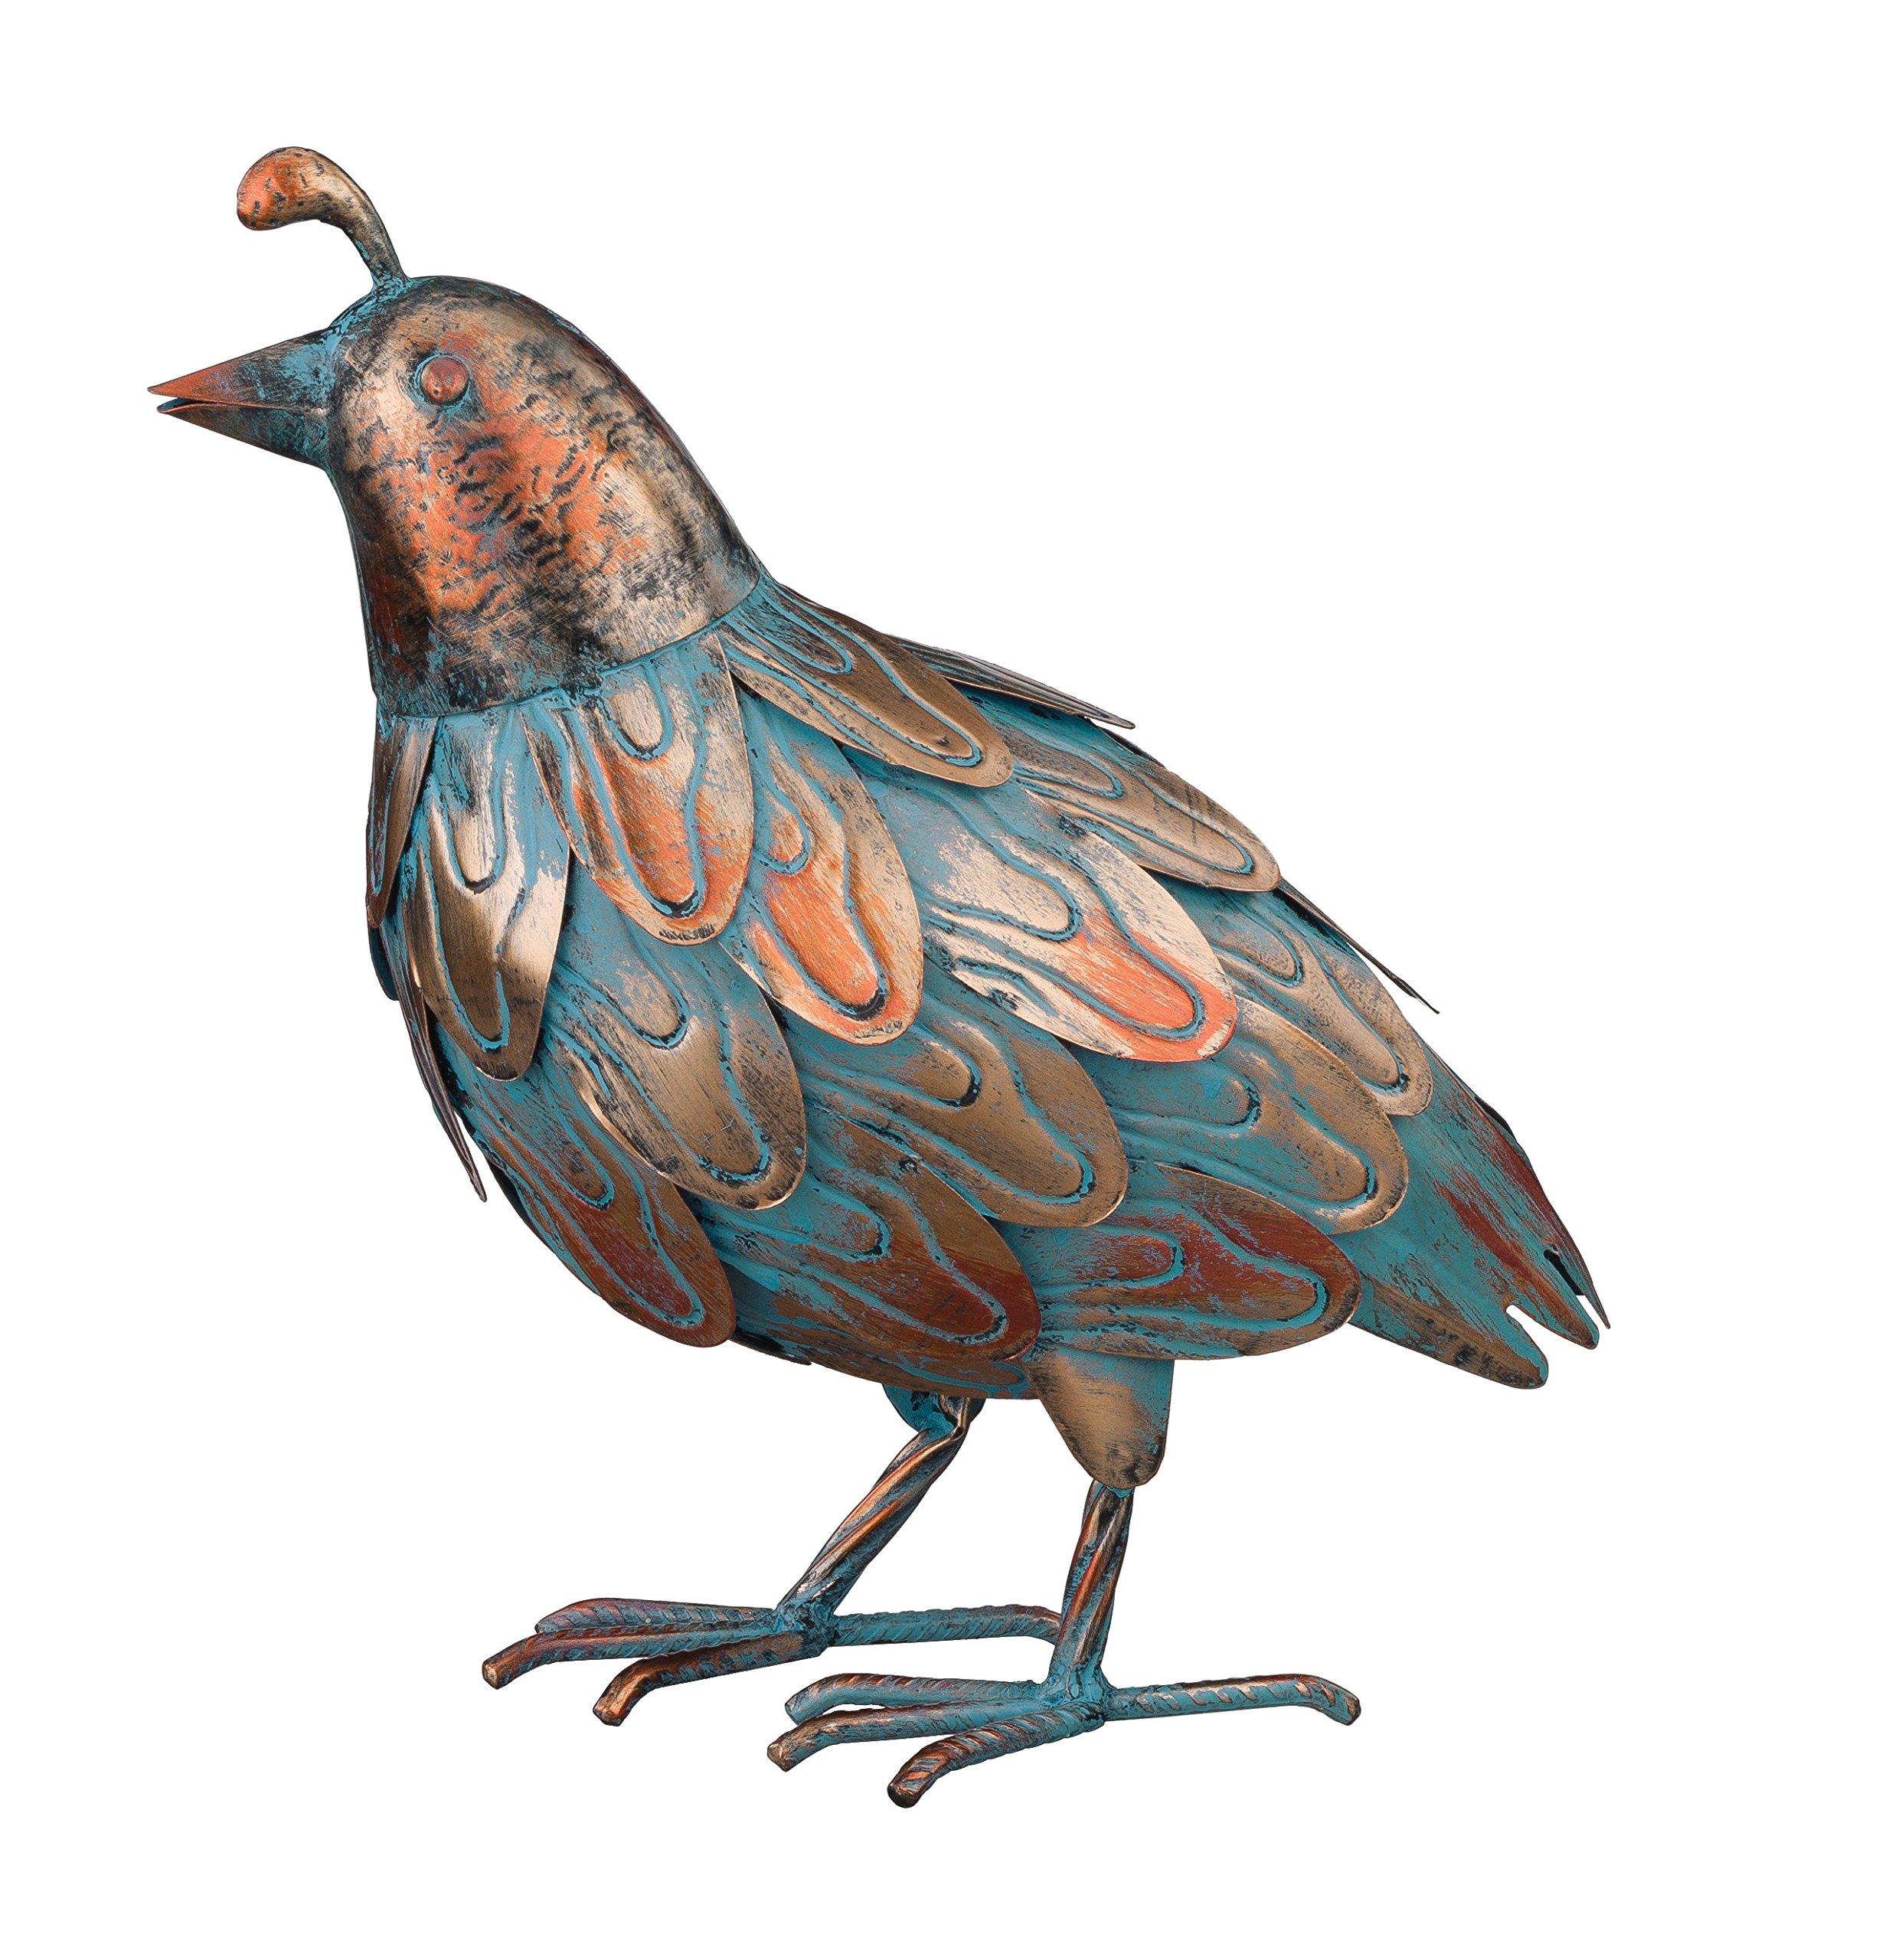 Regal Art & Gift 11308 Patina Quail Decorative Item, Up by Regal Art & Gift